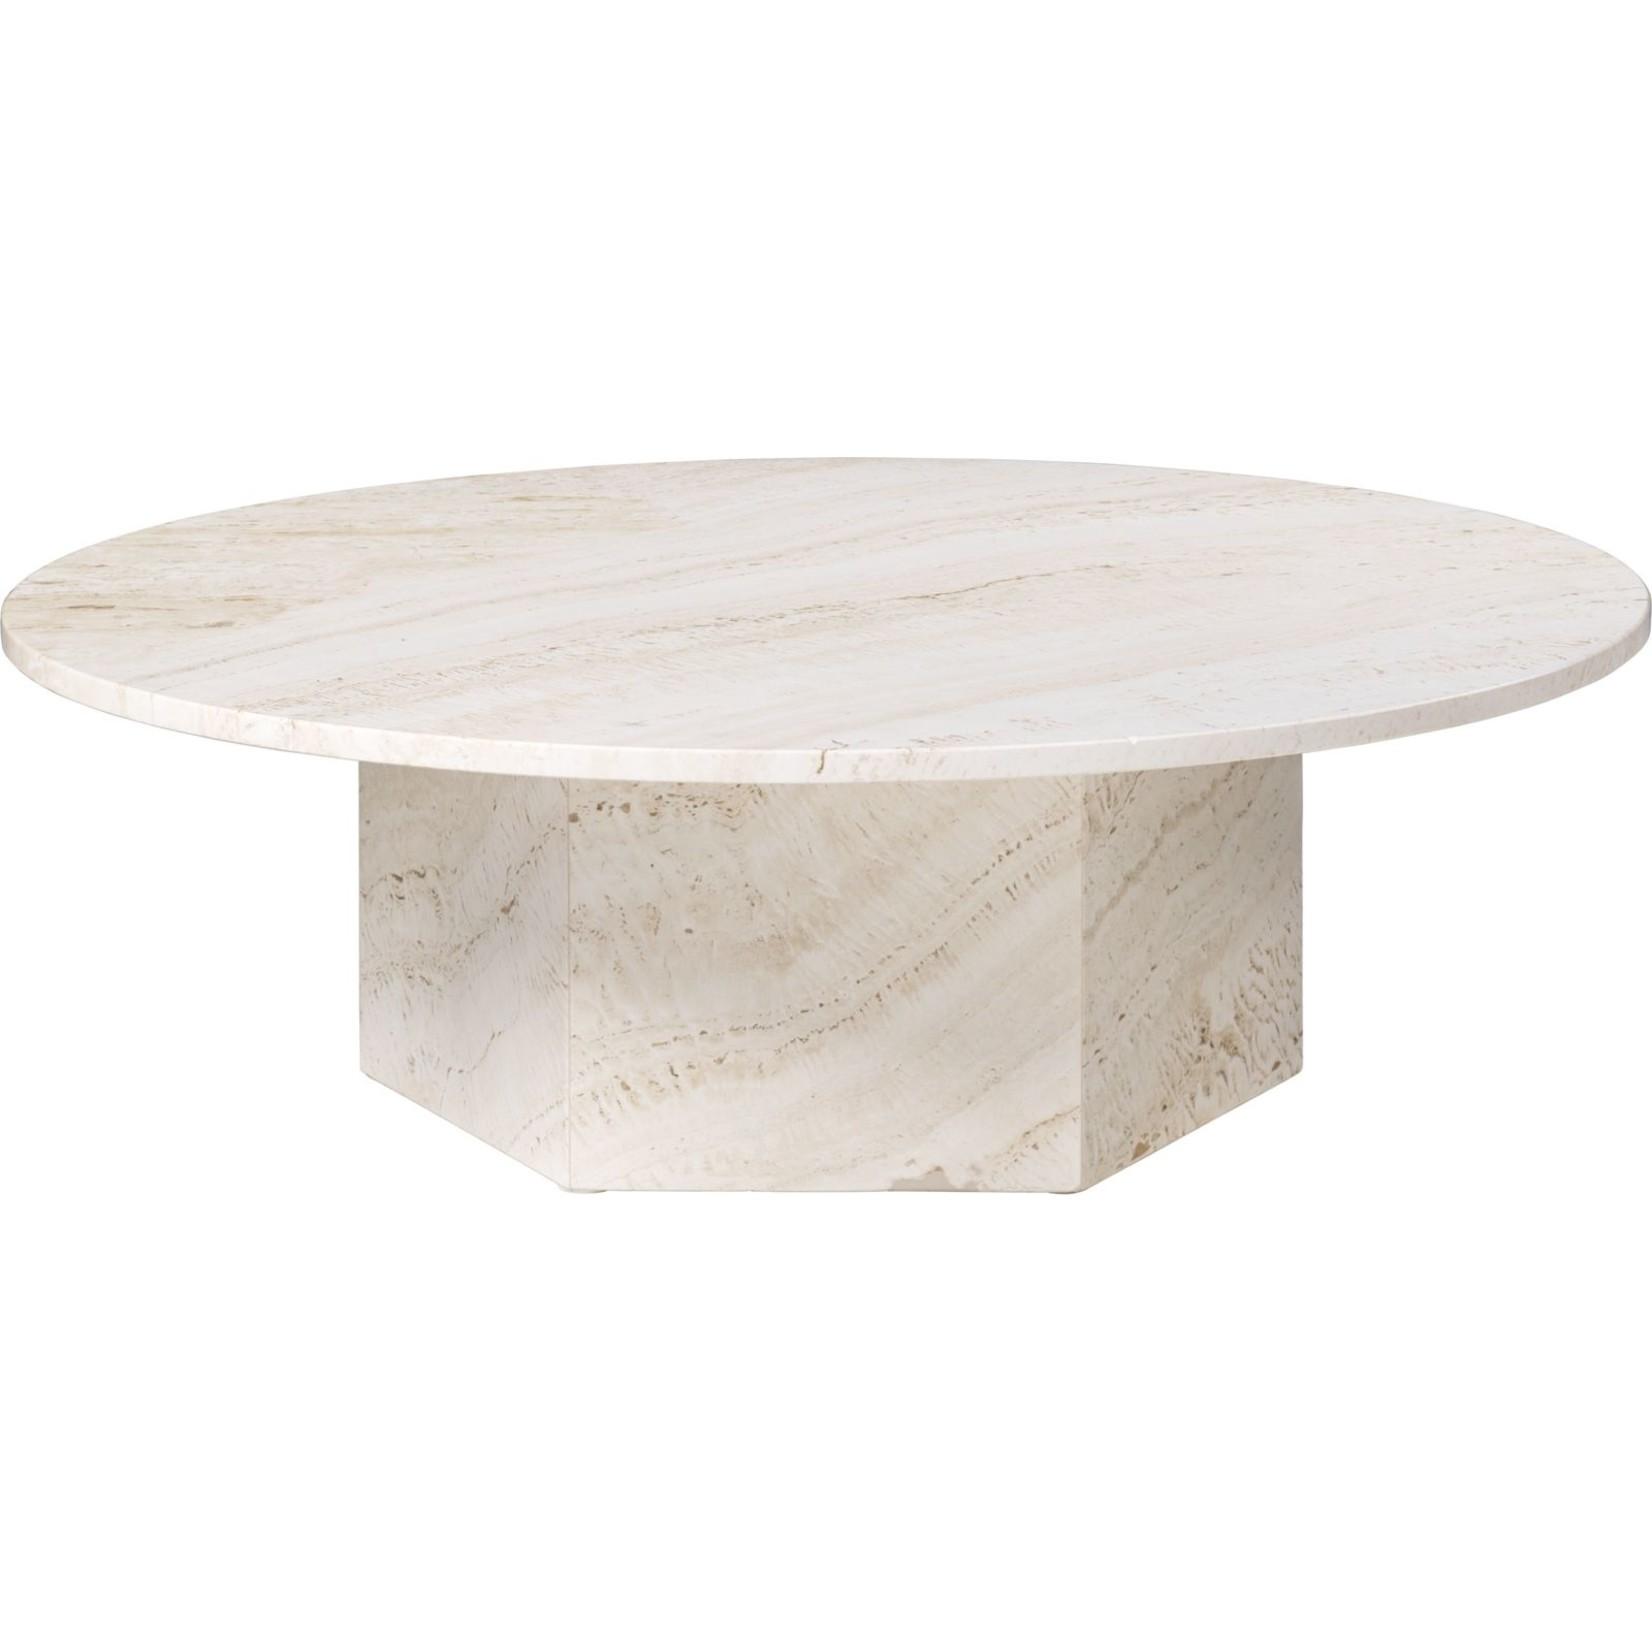 Gubi Epic Coffee Table Round Ø110 | White Travertine